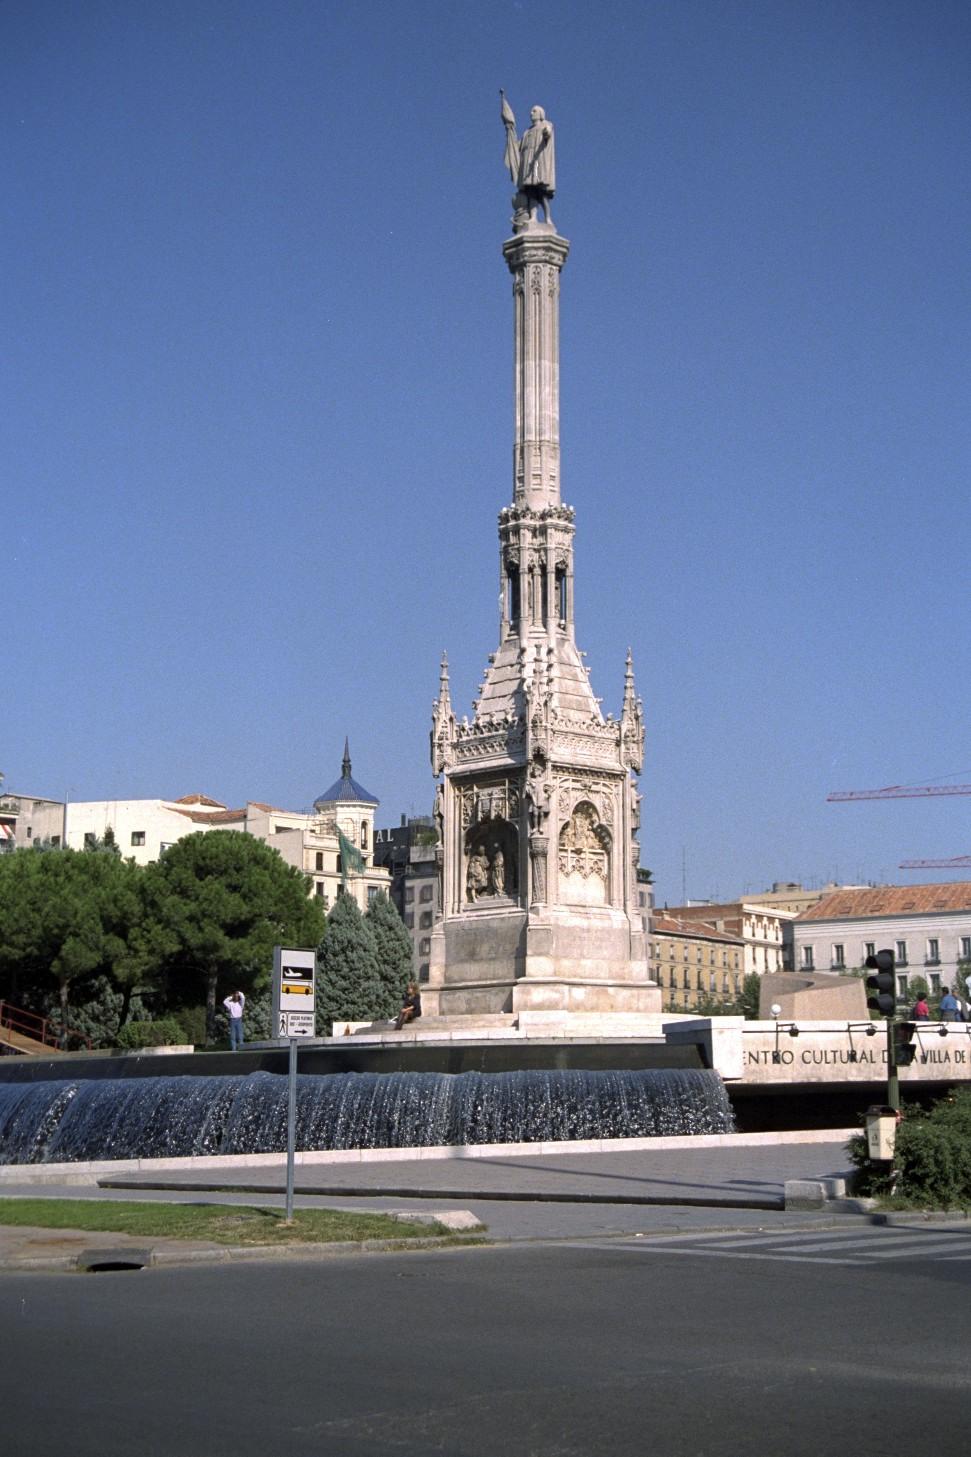 Cólon, Plaza de Cólon, Madrid